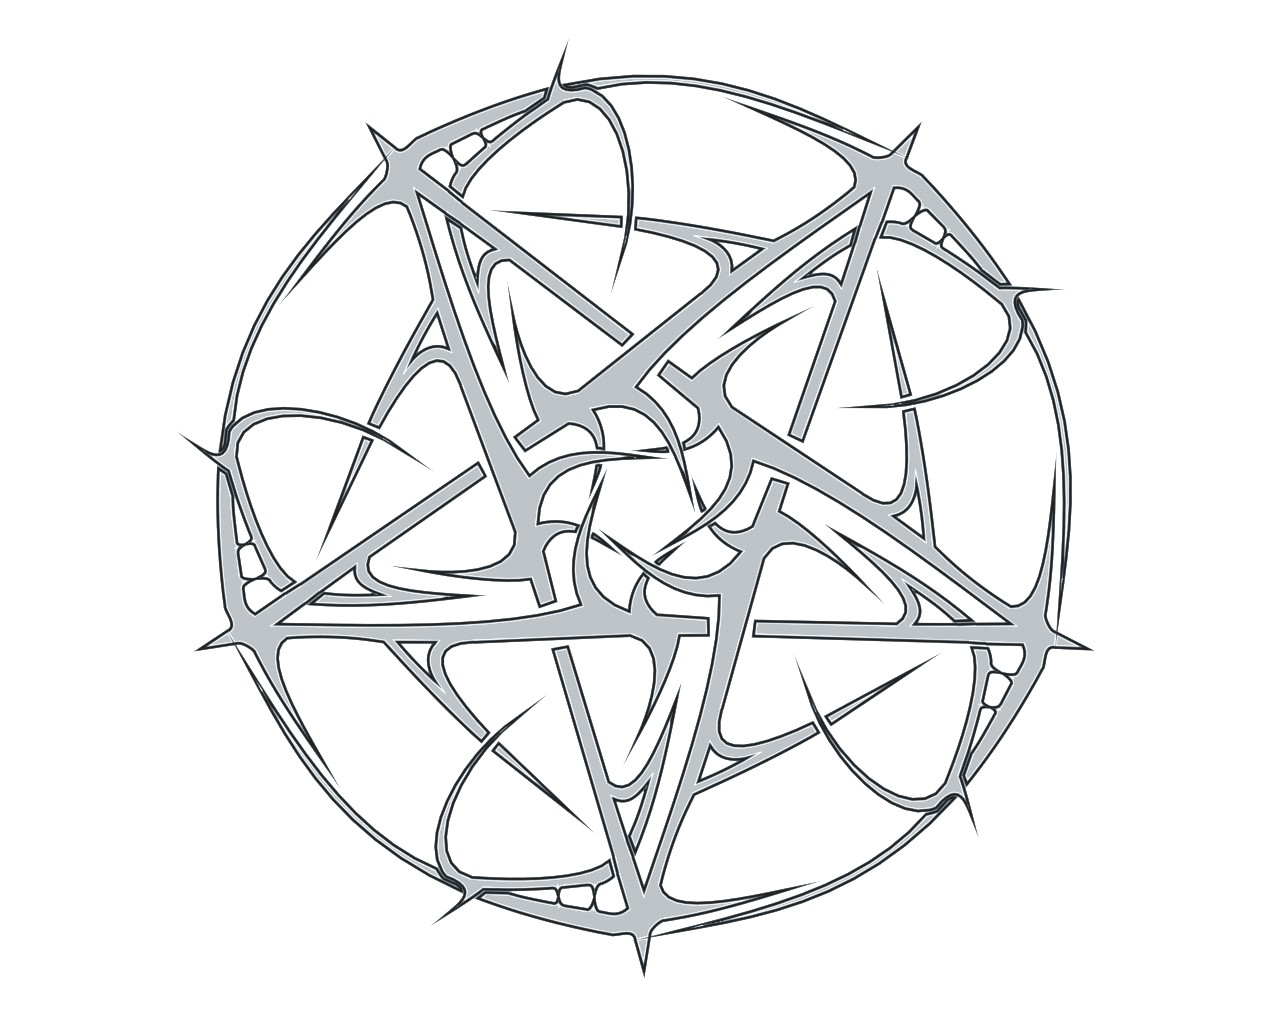 Just another pentagram